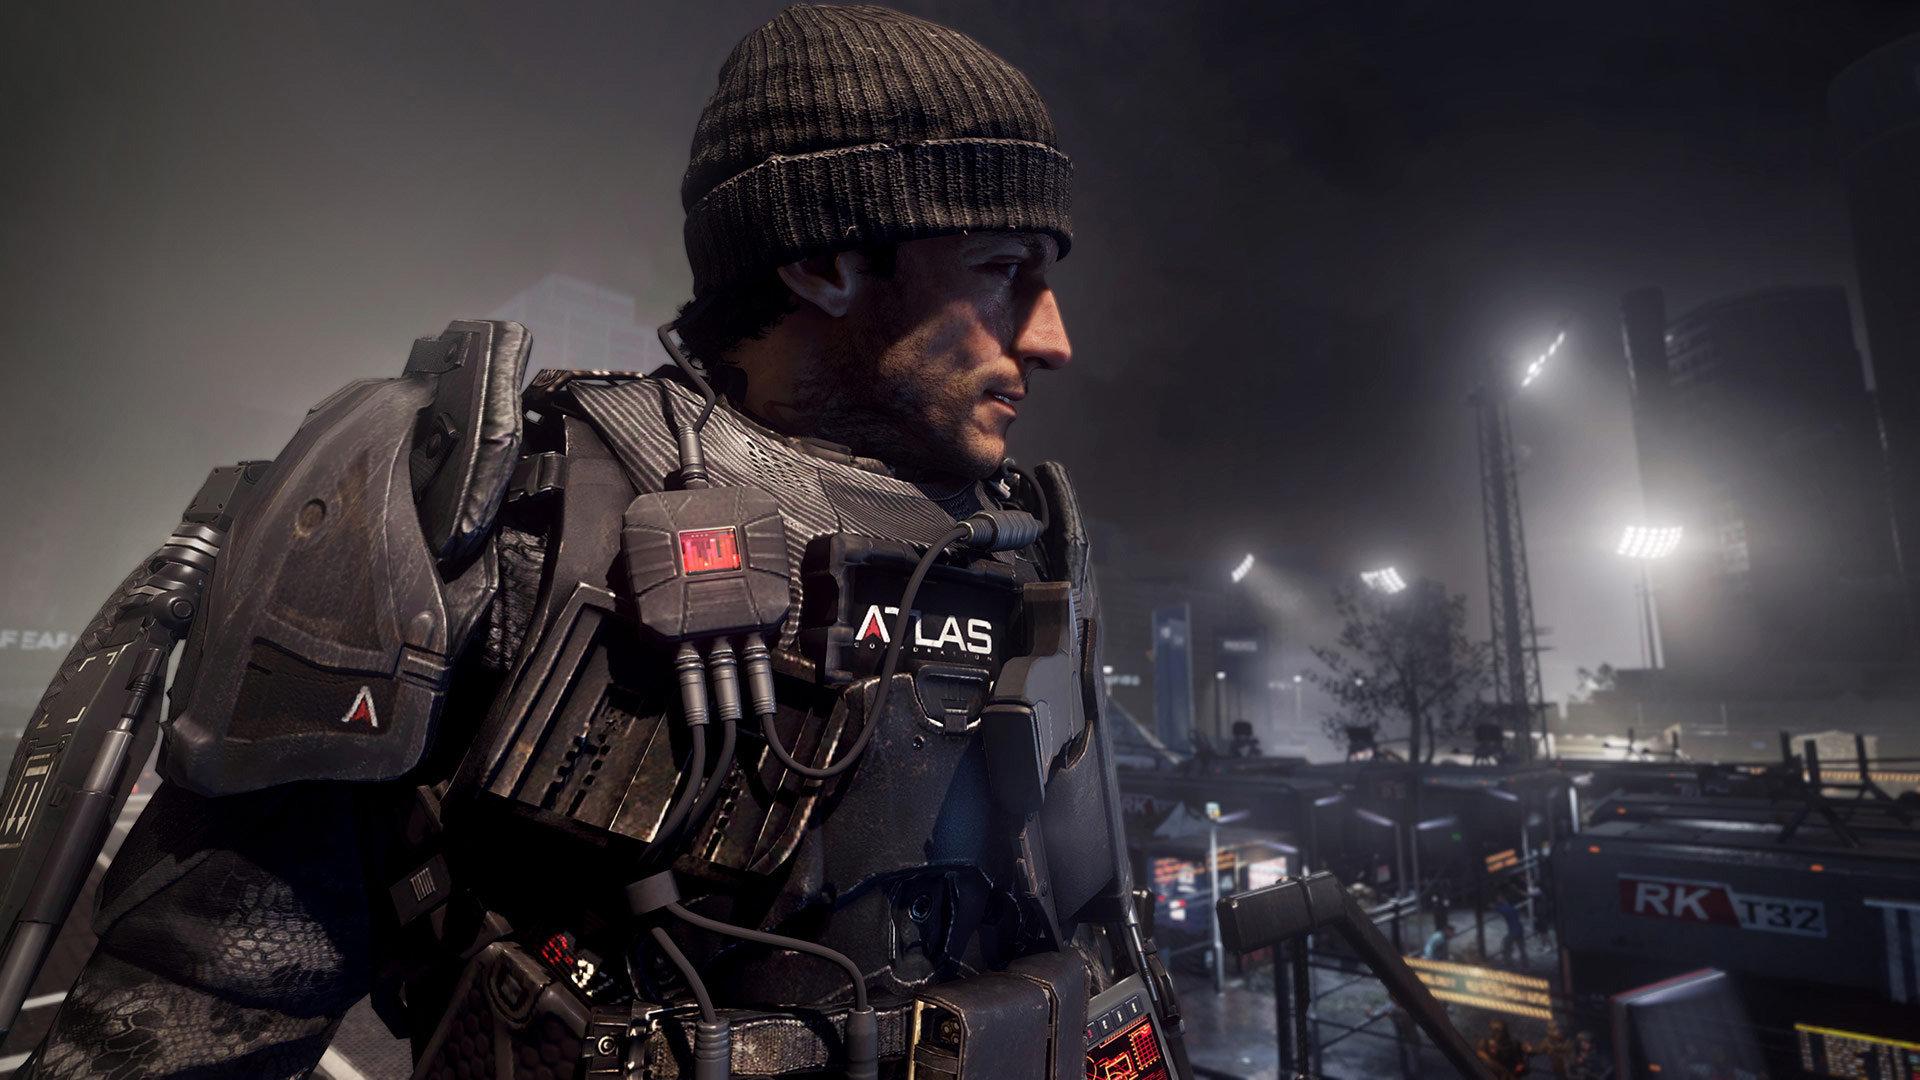 call-of-duty-advanced-warfare-main-character-closeup